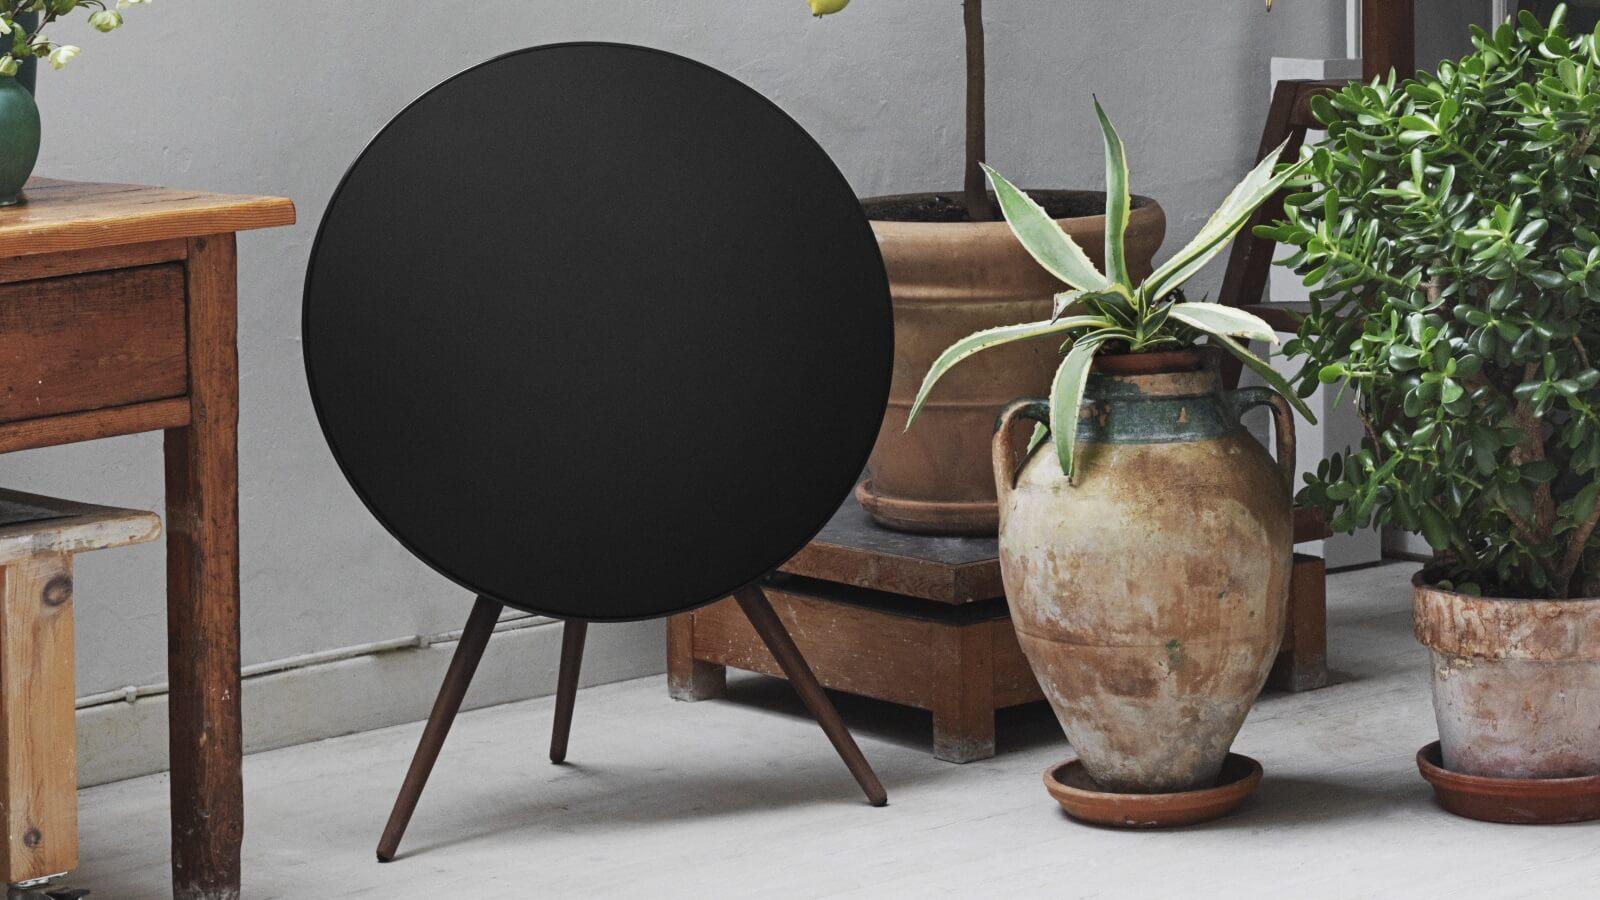 b o play beoplay a9 mkii multiroom audiosystem airplay dlna chromecast ebay. Black Bedroom Furniture Sets. Home Design Ideas